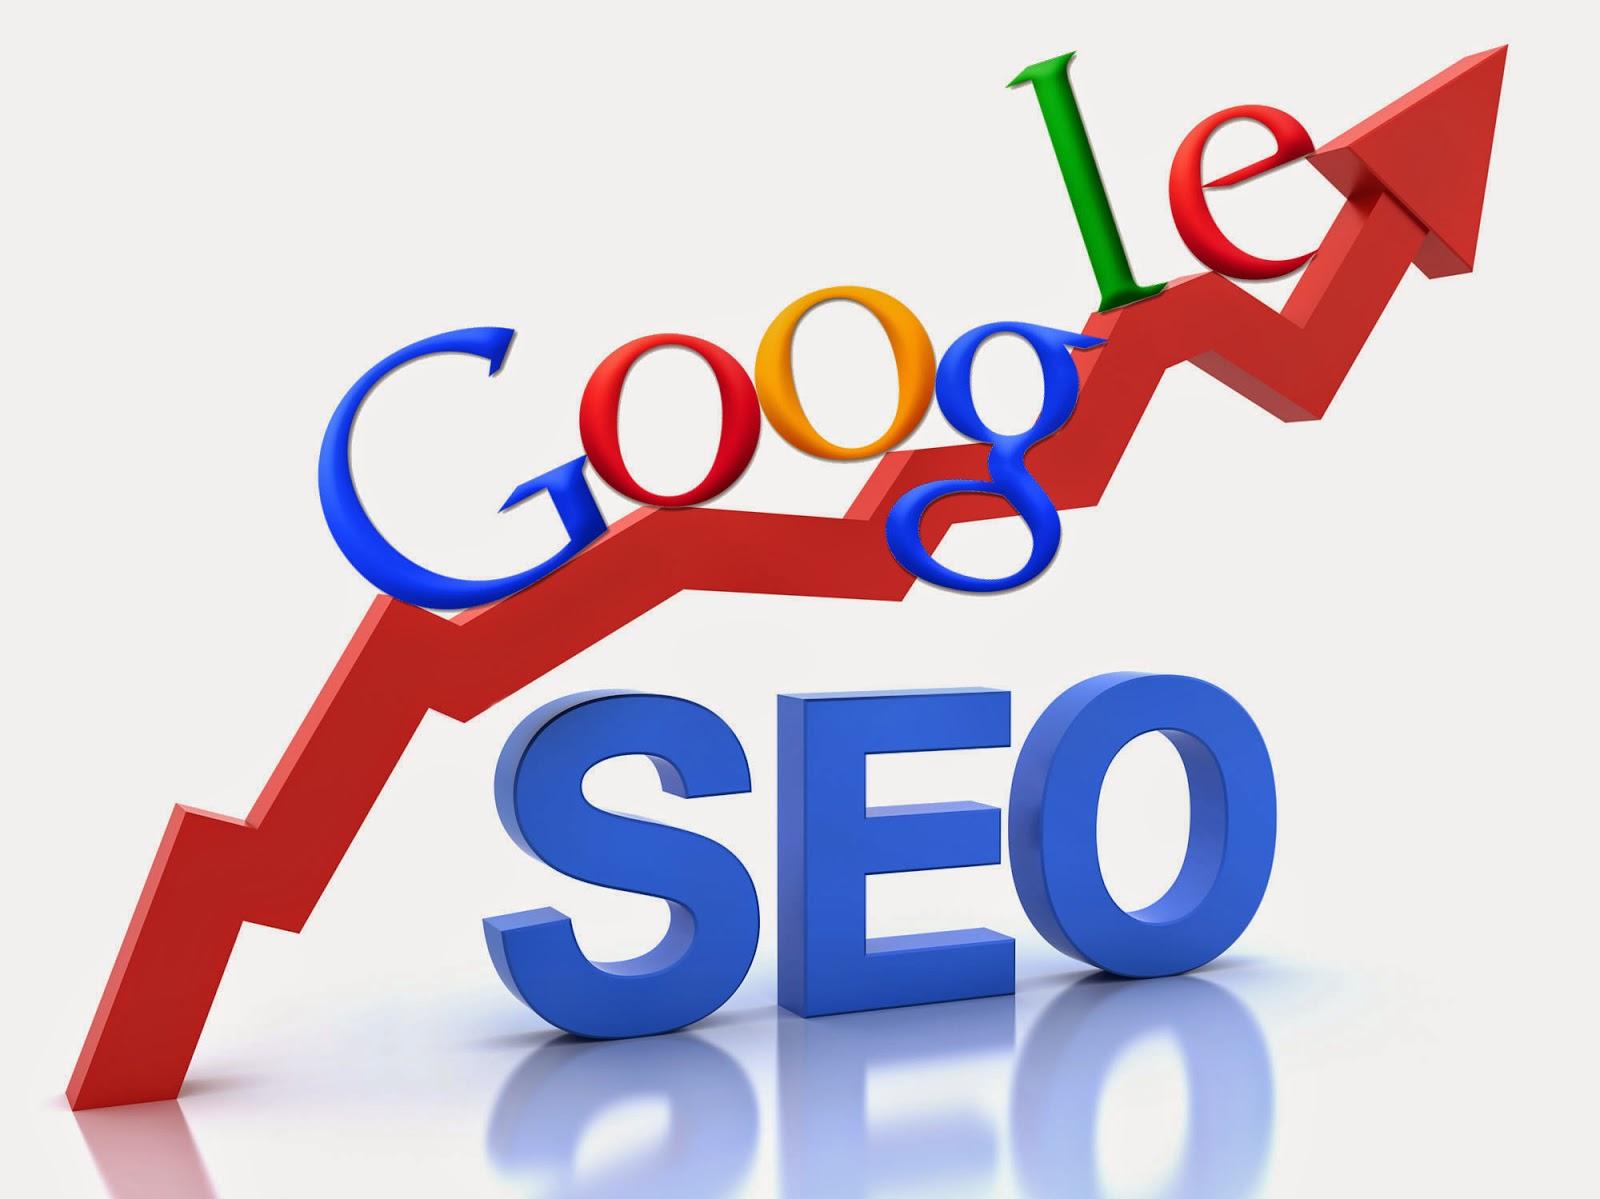 Web Creation Nepal Web Development Web Designer Nepal Web Promotion Web Design Nepal Web Company 21 Essential Seo Tips Techniques